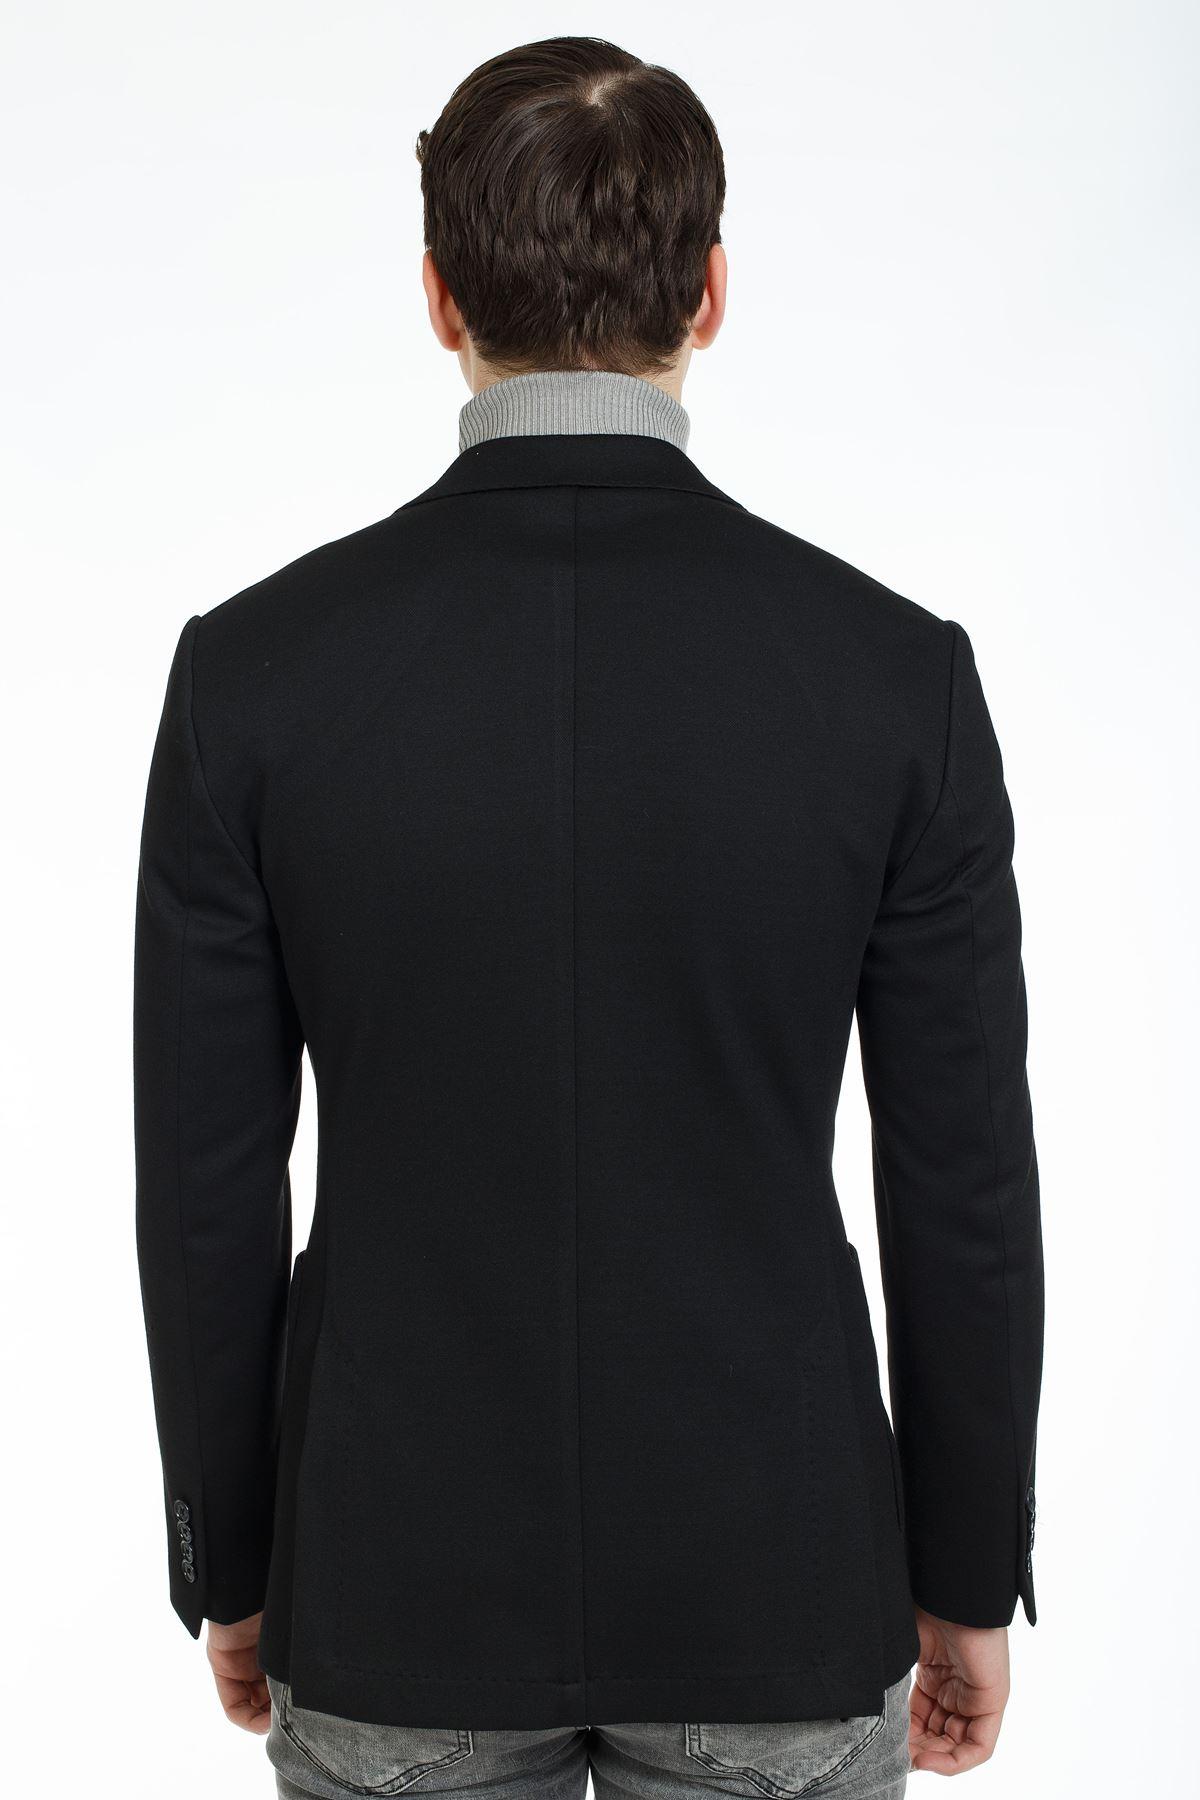 Siyah Örme Kumaş Süper Slim Kalıp Spor Ceket